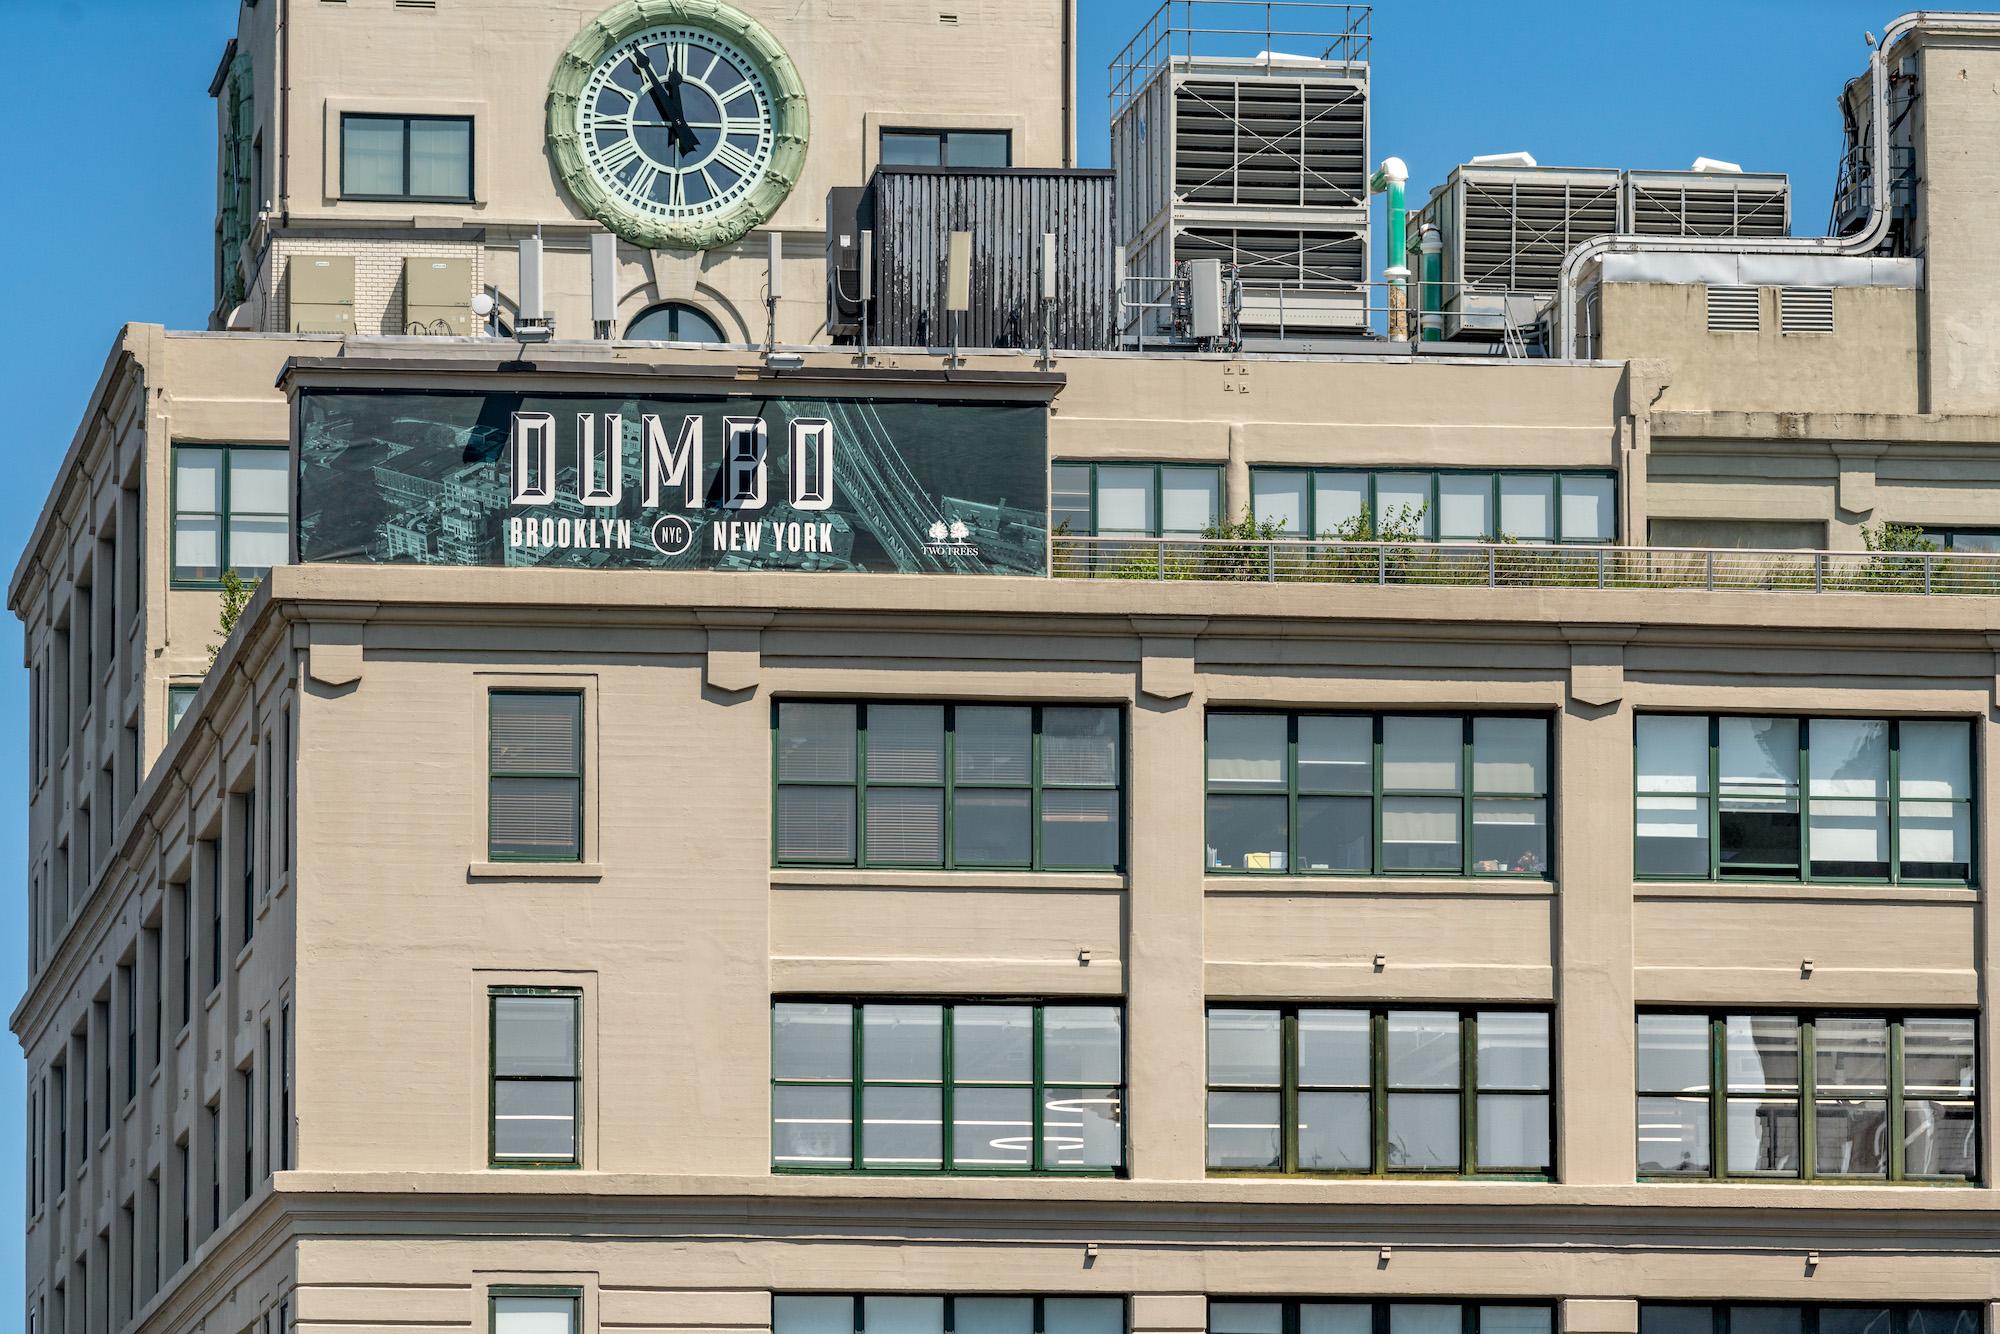 Go inside Bjarke Ingels' vibrant new U S  headquarters in Dumbo | 6sqft